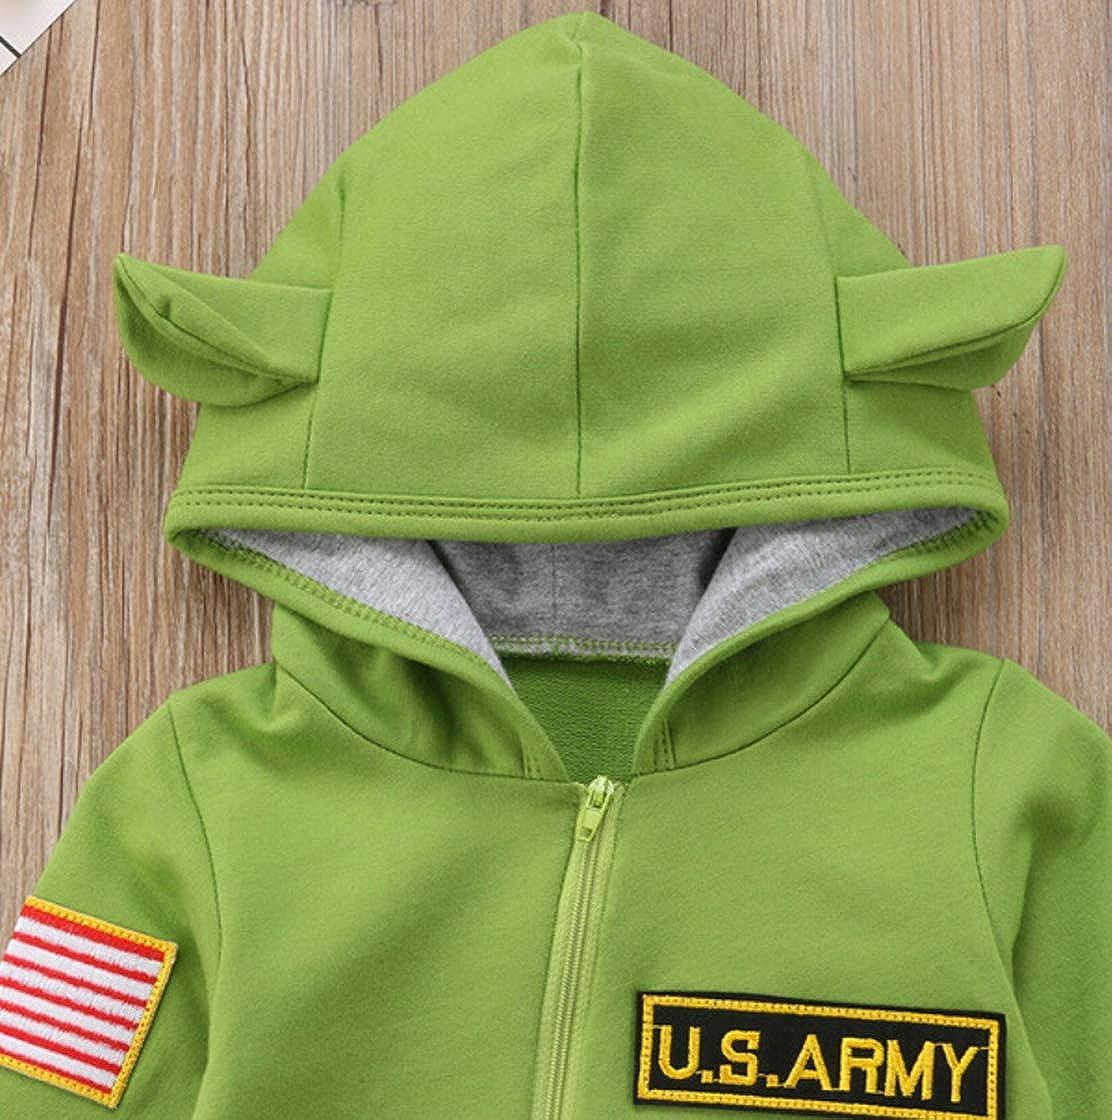 unniful Newborn Baby Cute Long Sleeve Zipper Romper Toddler Long Pants Jumpsuit Bodysuits